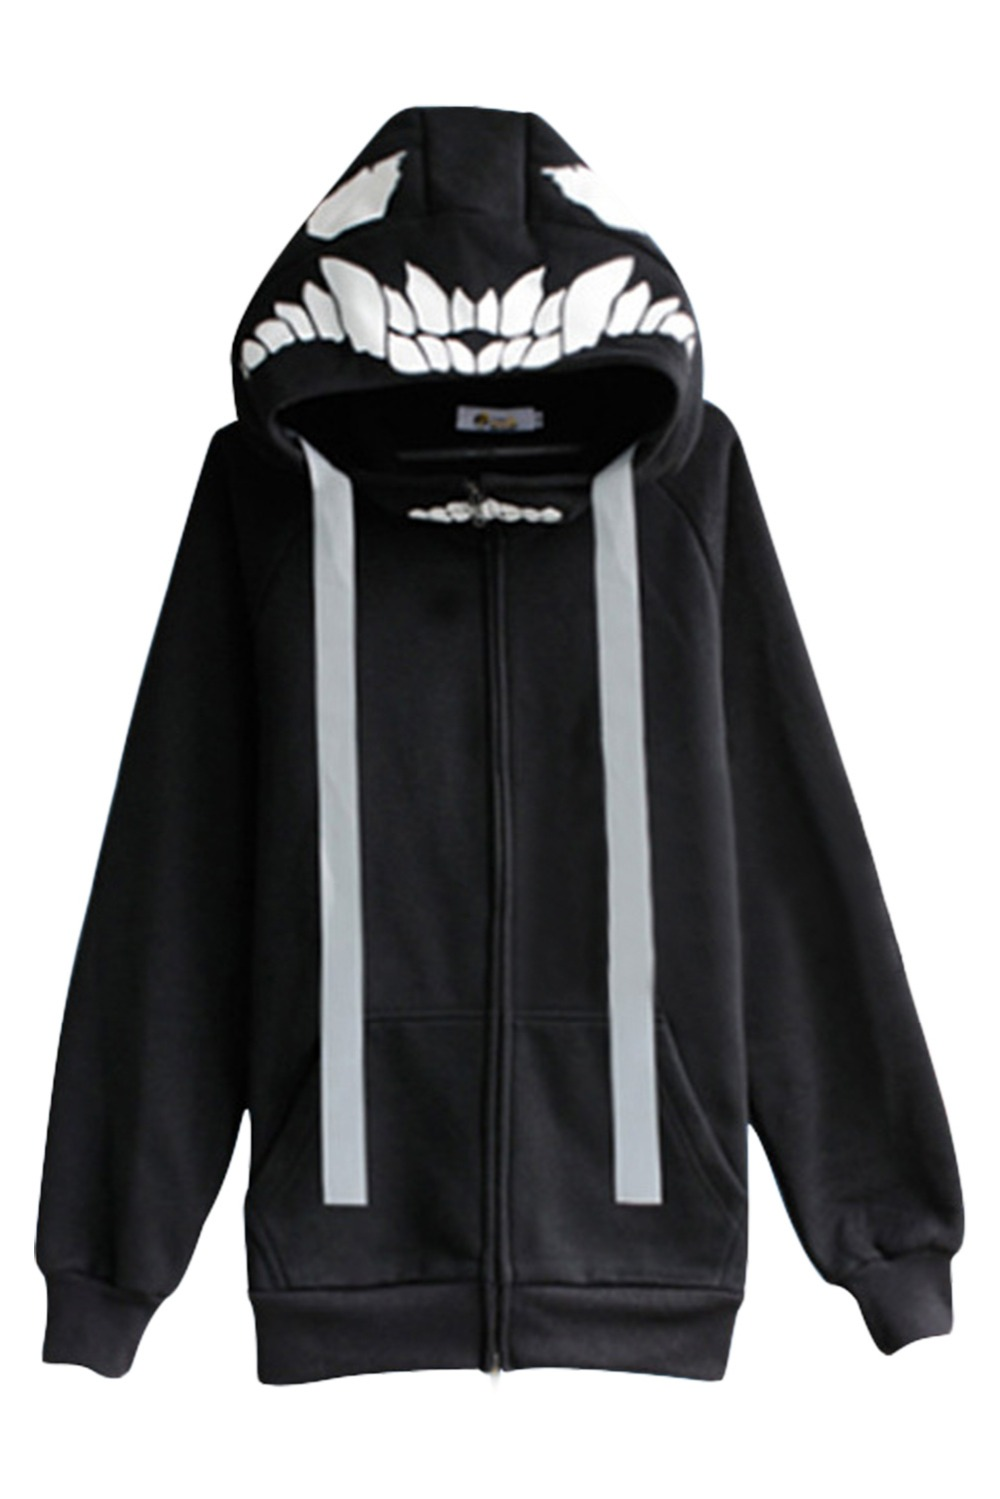 Anime Kantai Collection Hoodies Cotton Short Sleeve Pullover Sweatshirt Jacket